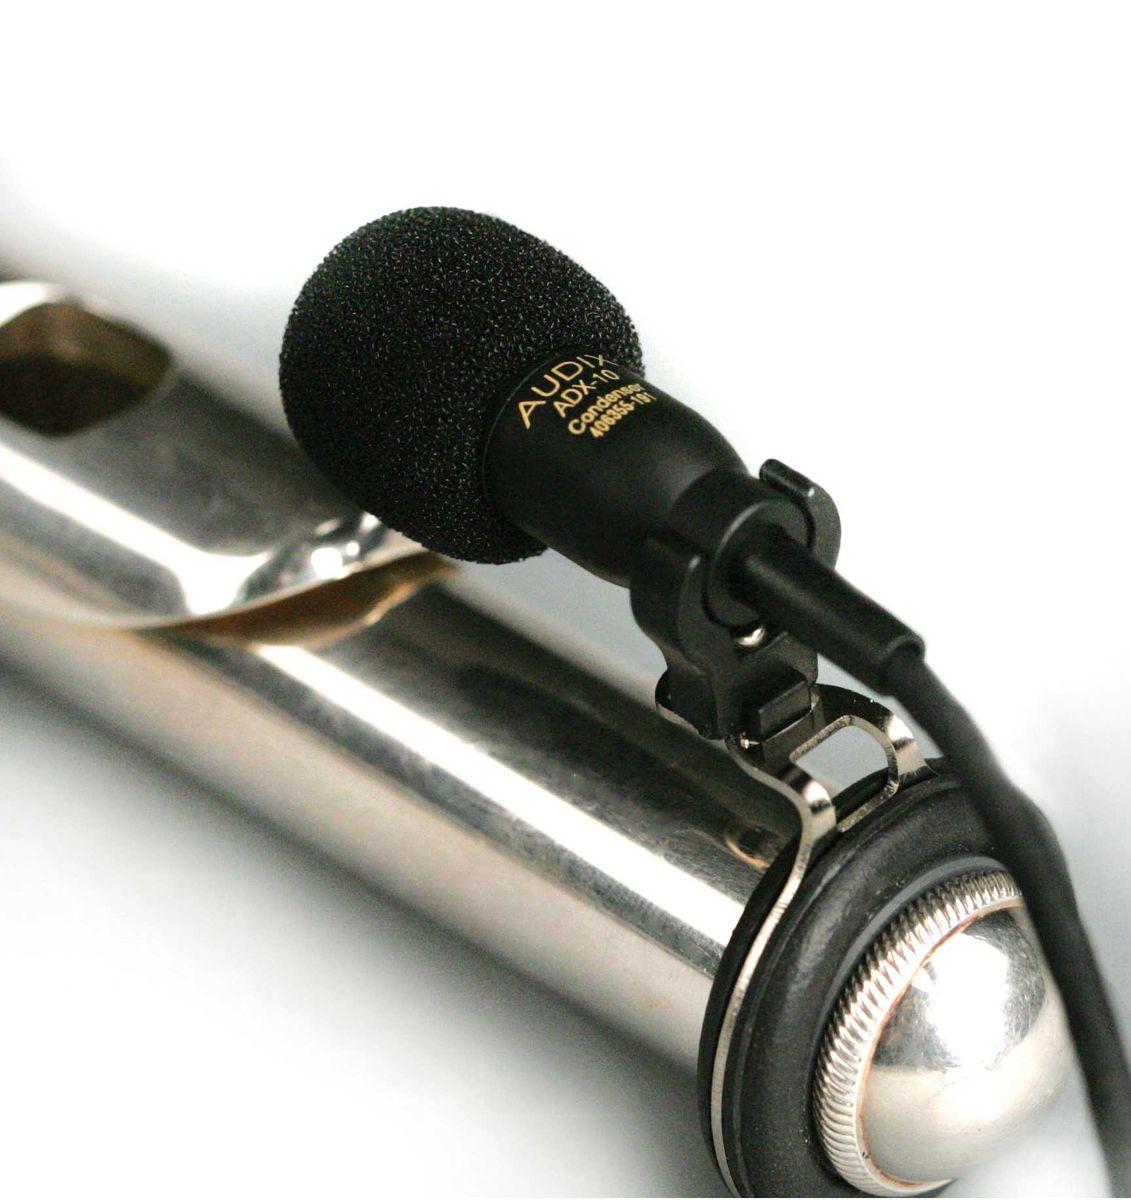 Instruments Vent Sono Page N 2 Akg C519m Mic Saxophone